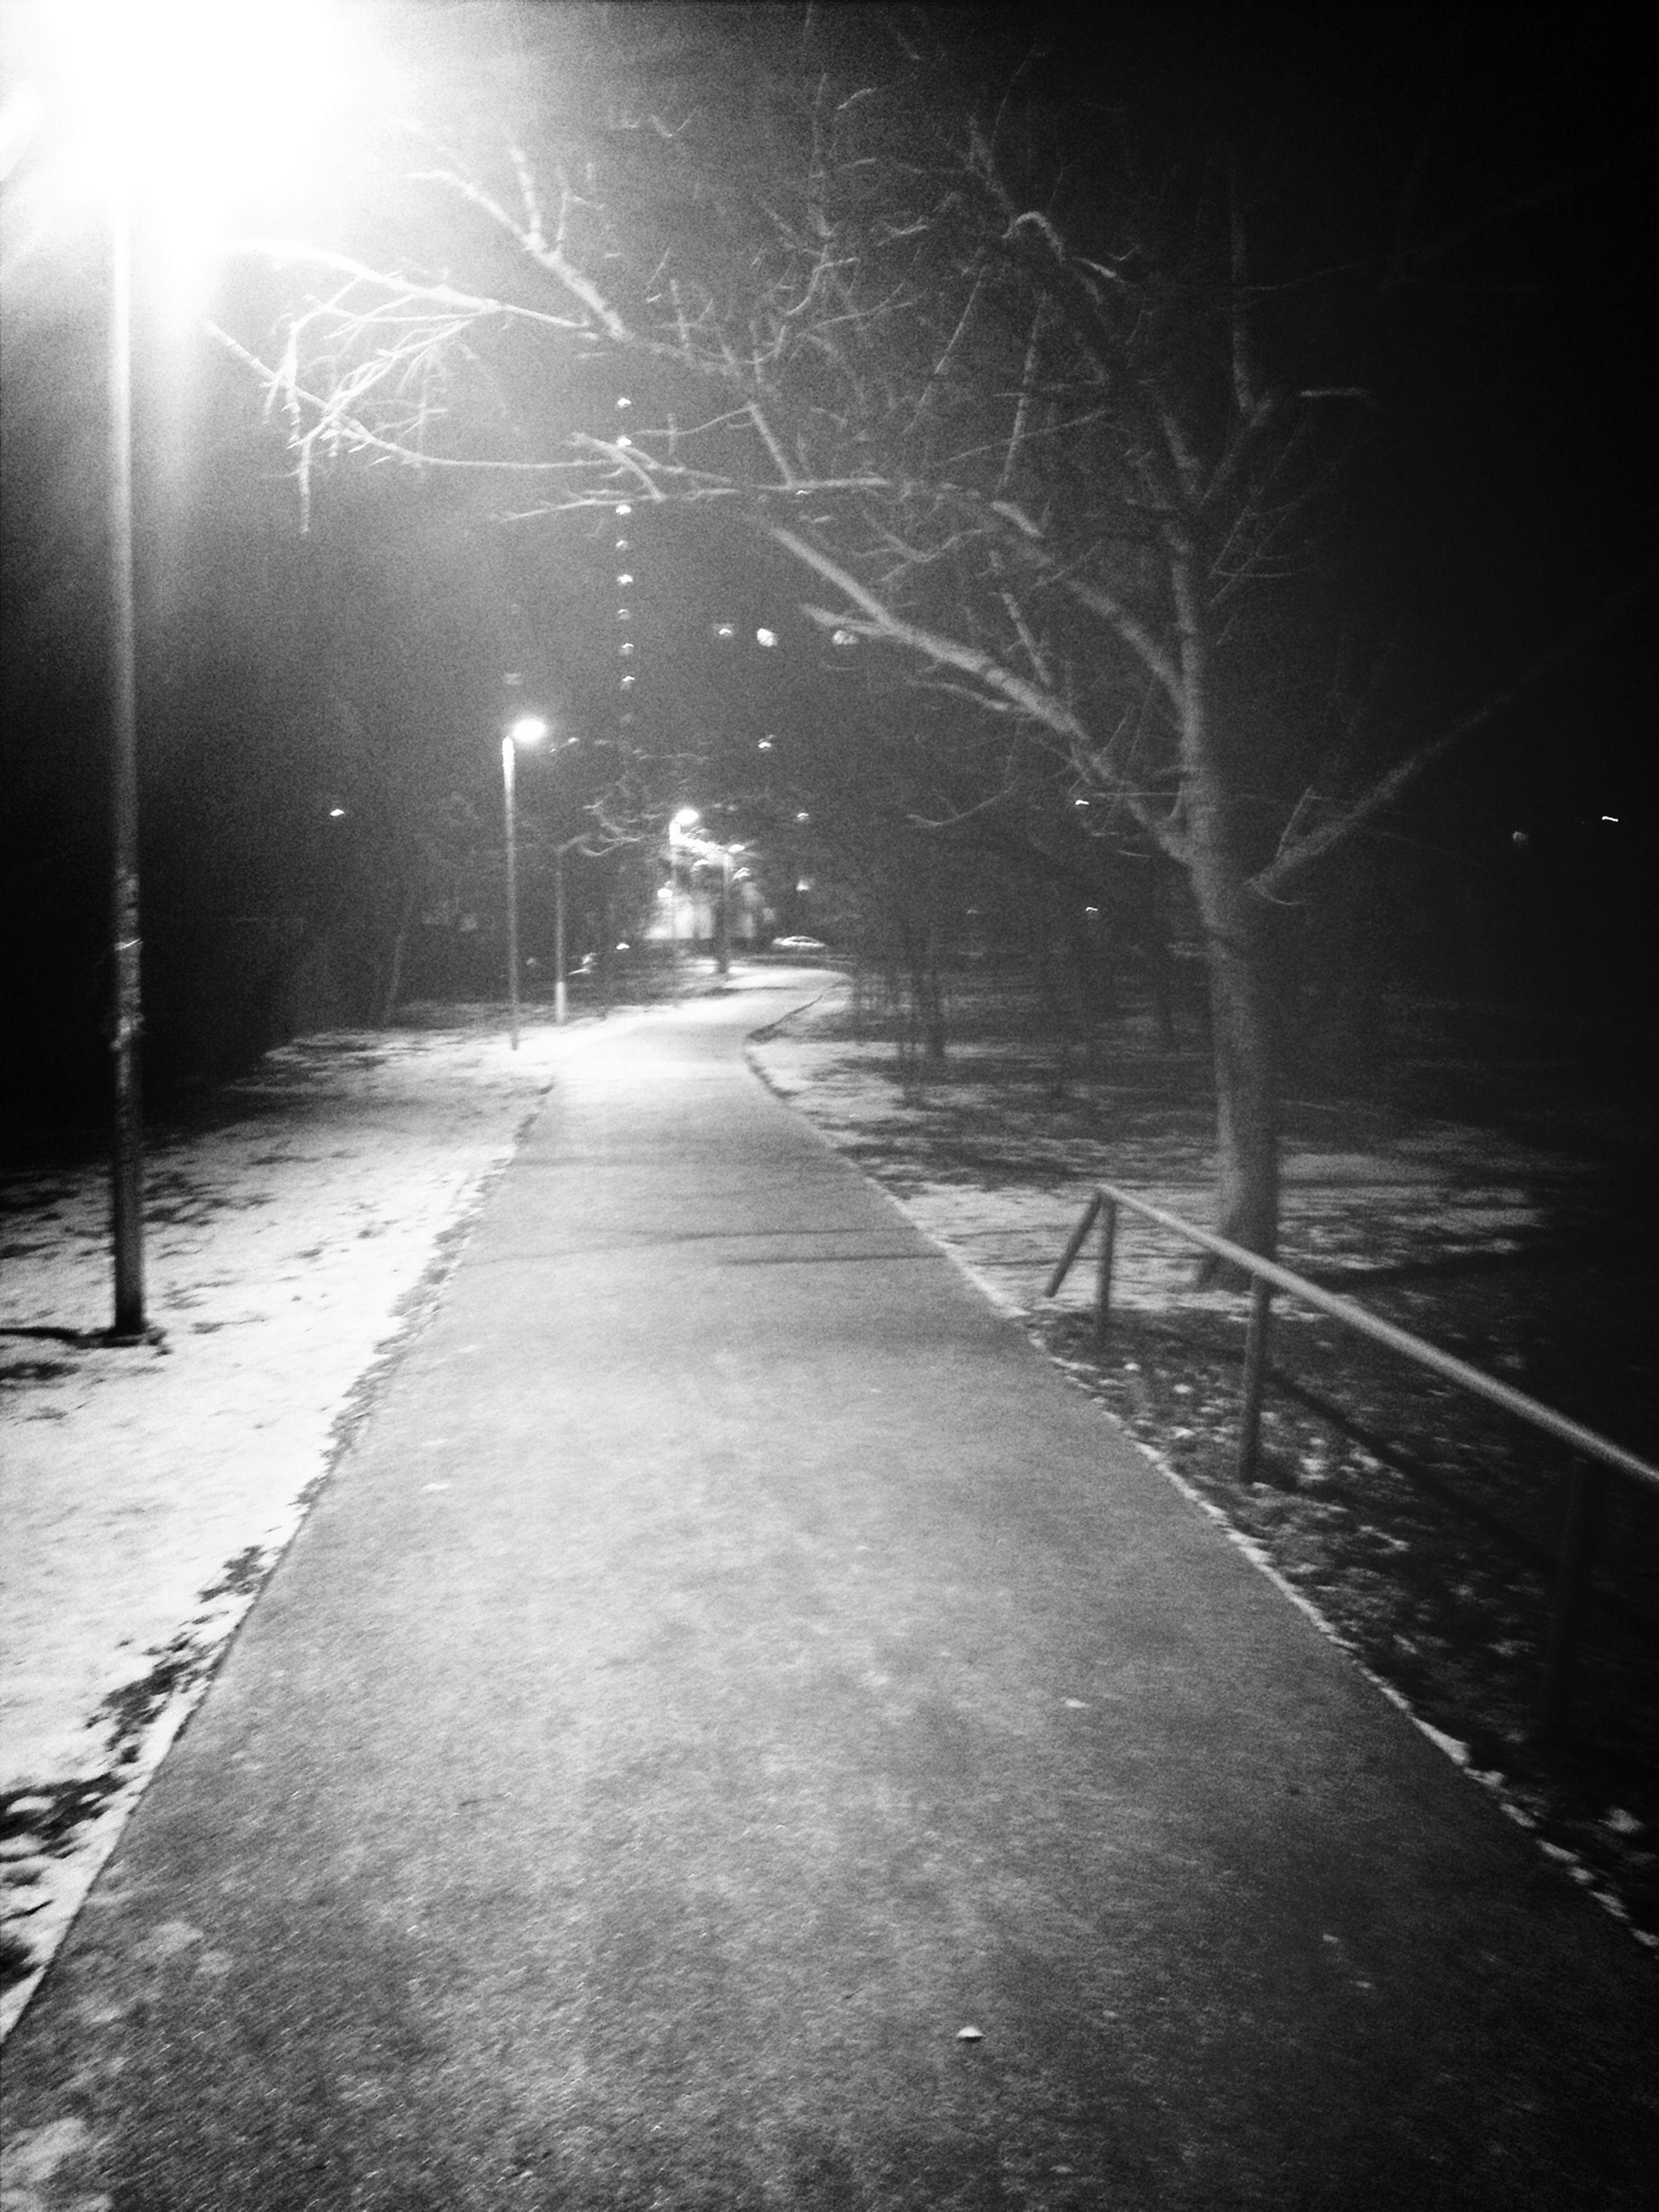 the way forward, illuminated, night, diminishing perspective, street light, vanishing point, lighting equipment, transportation, street, one person, road, railing, sidewalk, lens flare, footpath, outdoors, walkway, tree, season, long